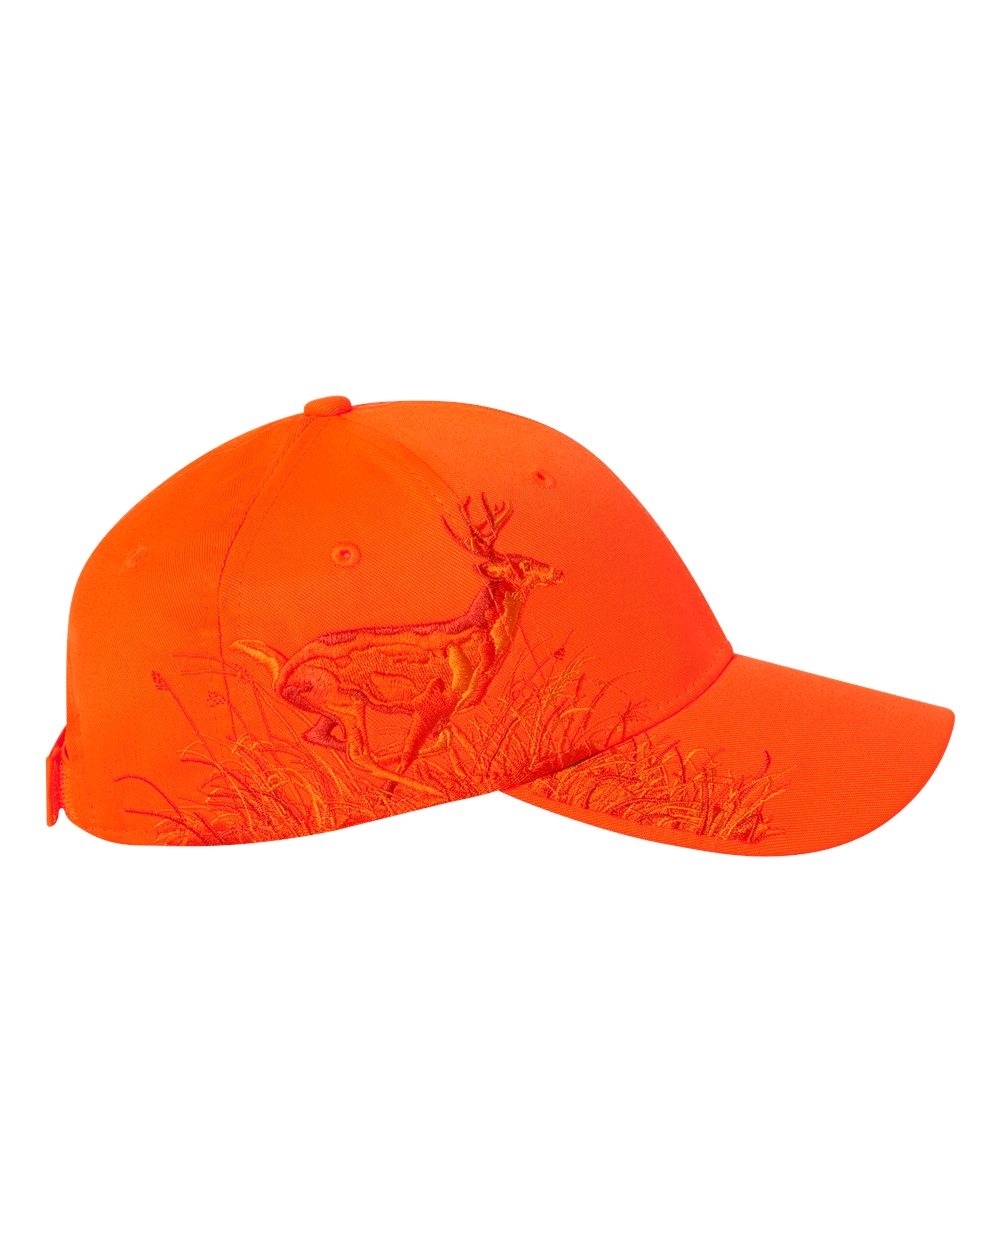 DRI DUCK 3301 - Wildlife Buck Cap